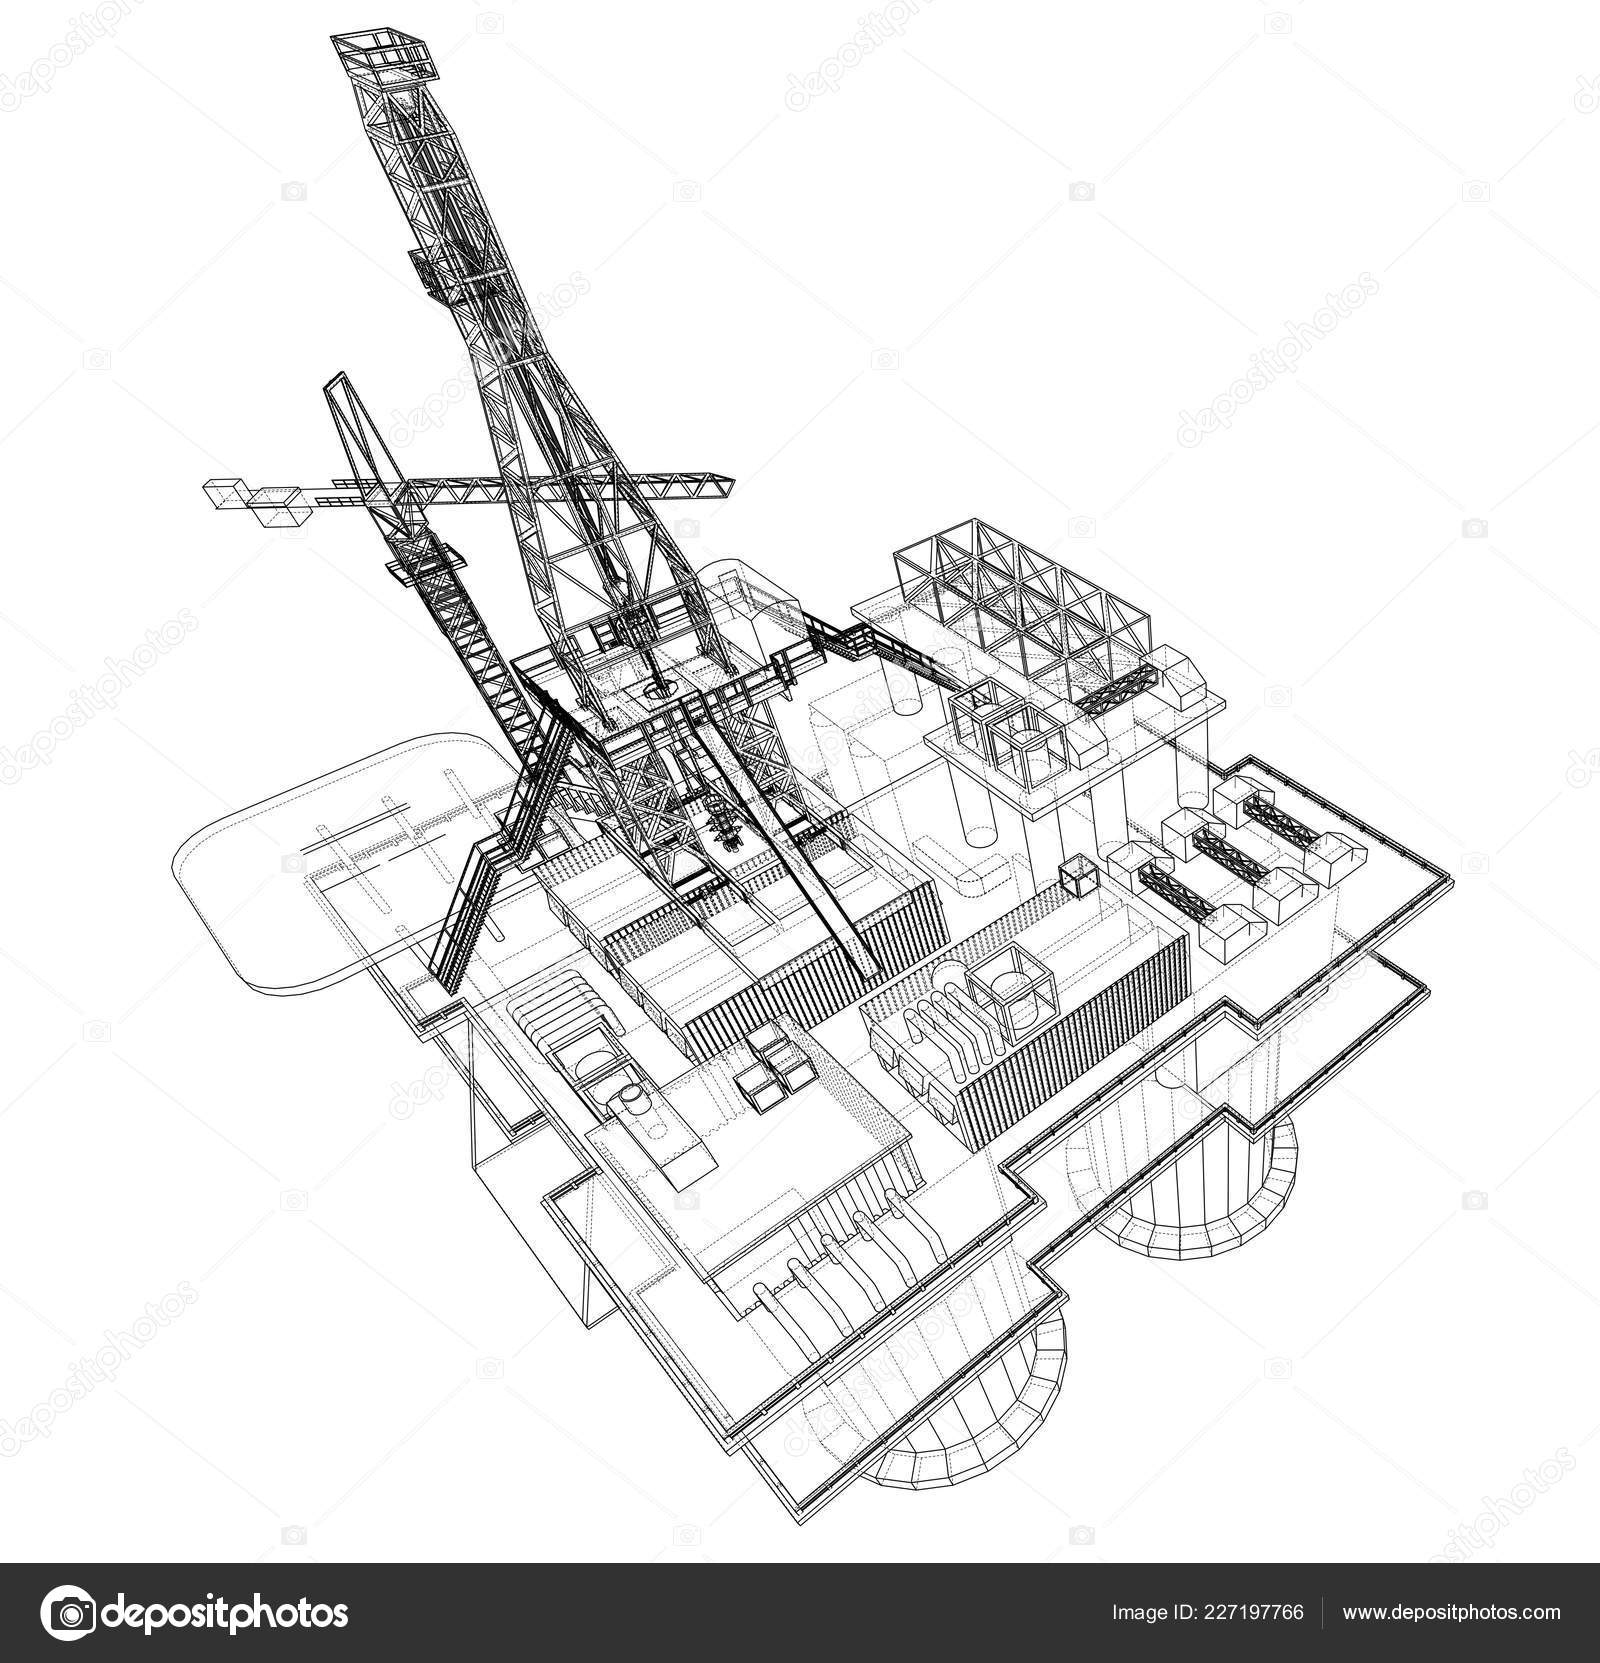 Offs oil rig drilling platform concept. Vector — Stock ... Ocean Drilling Rig Schematic Diagram on